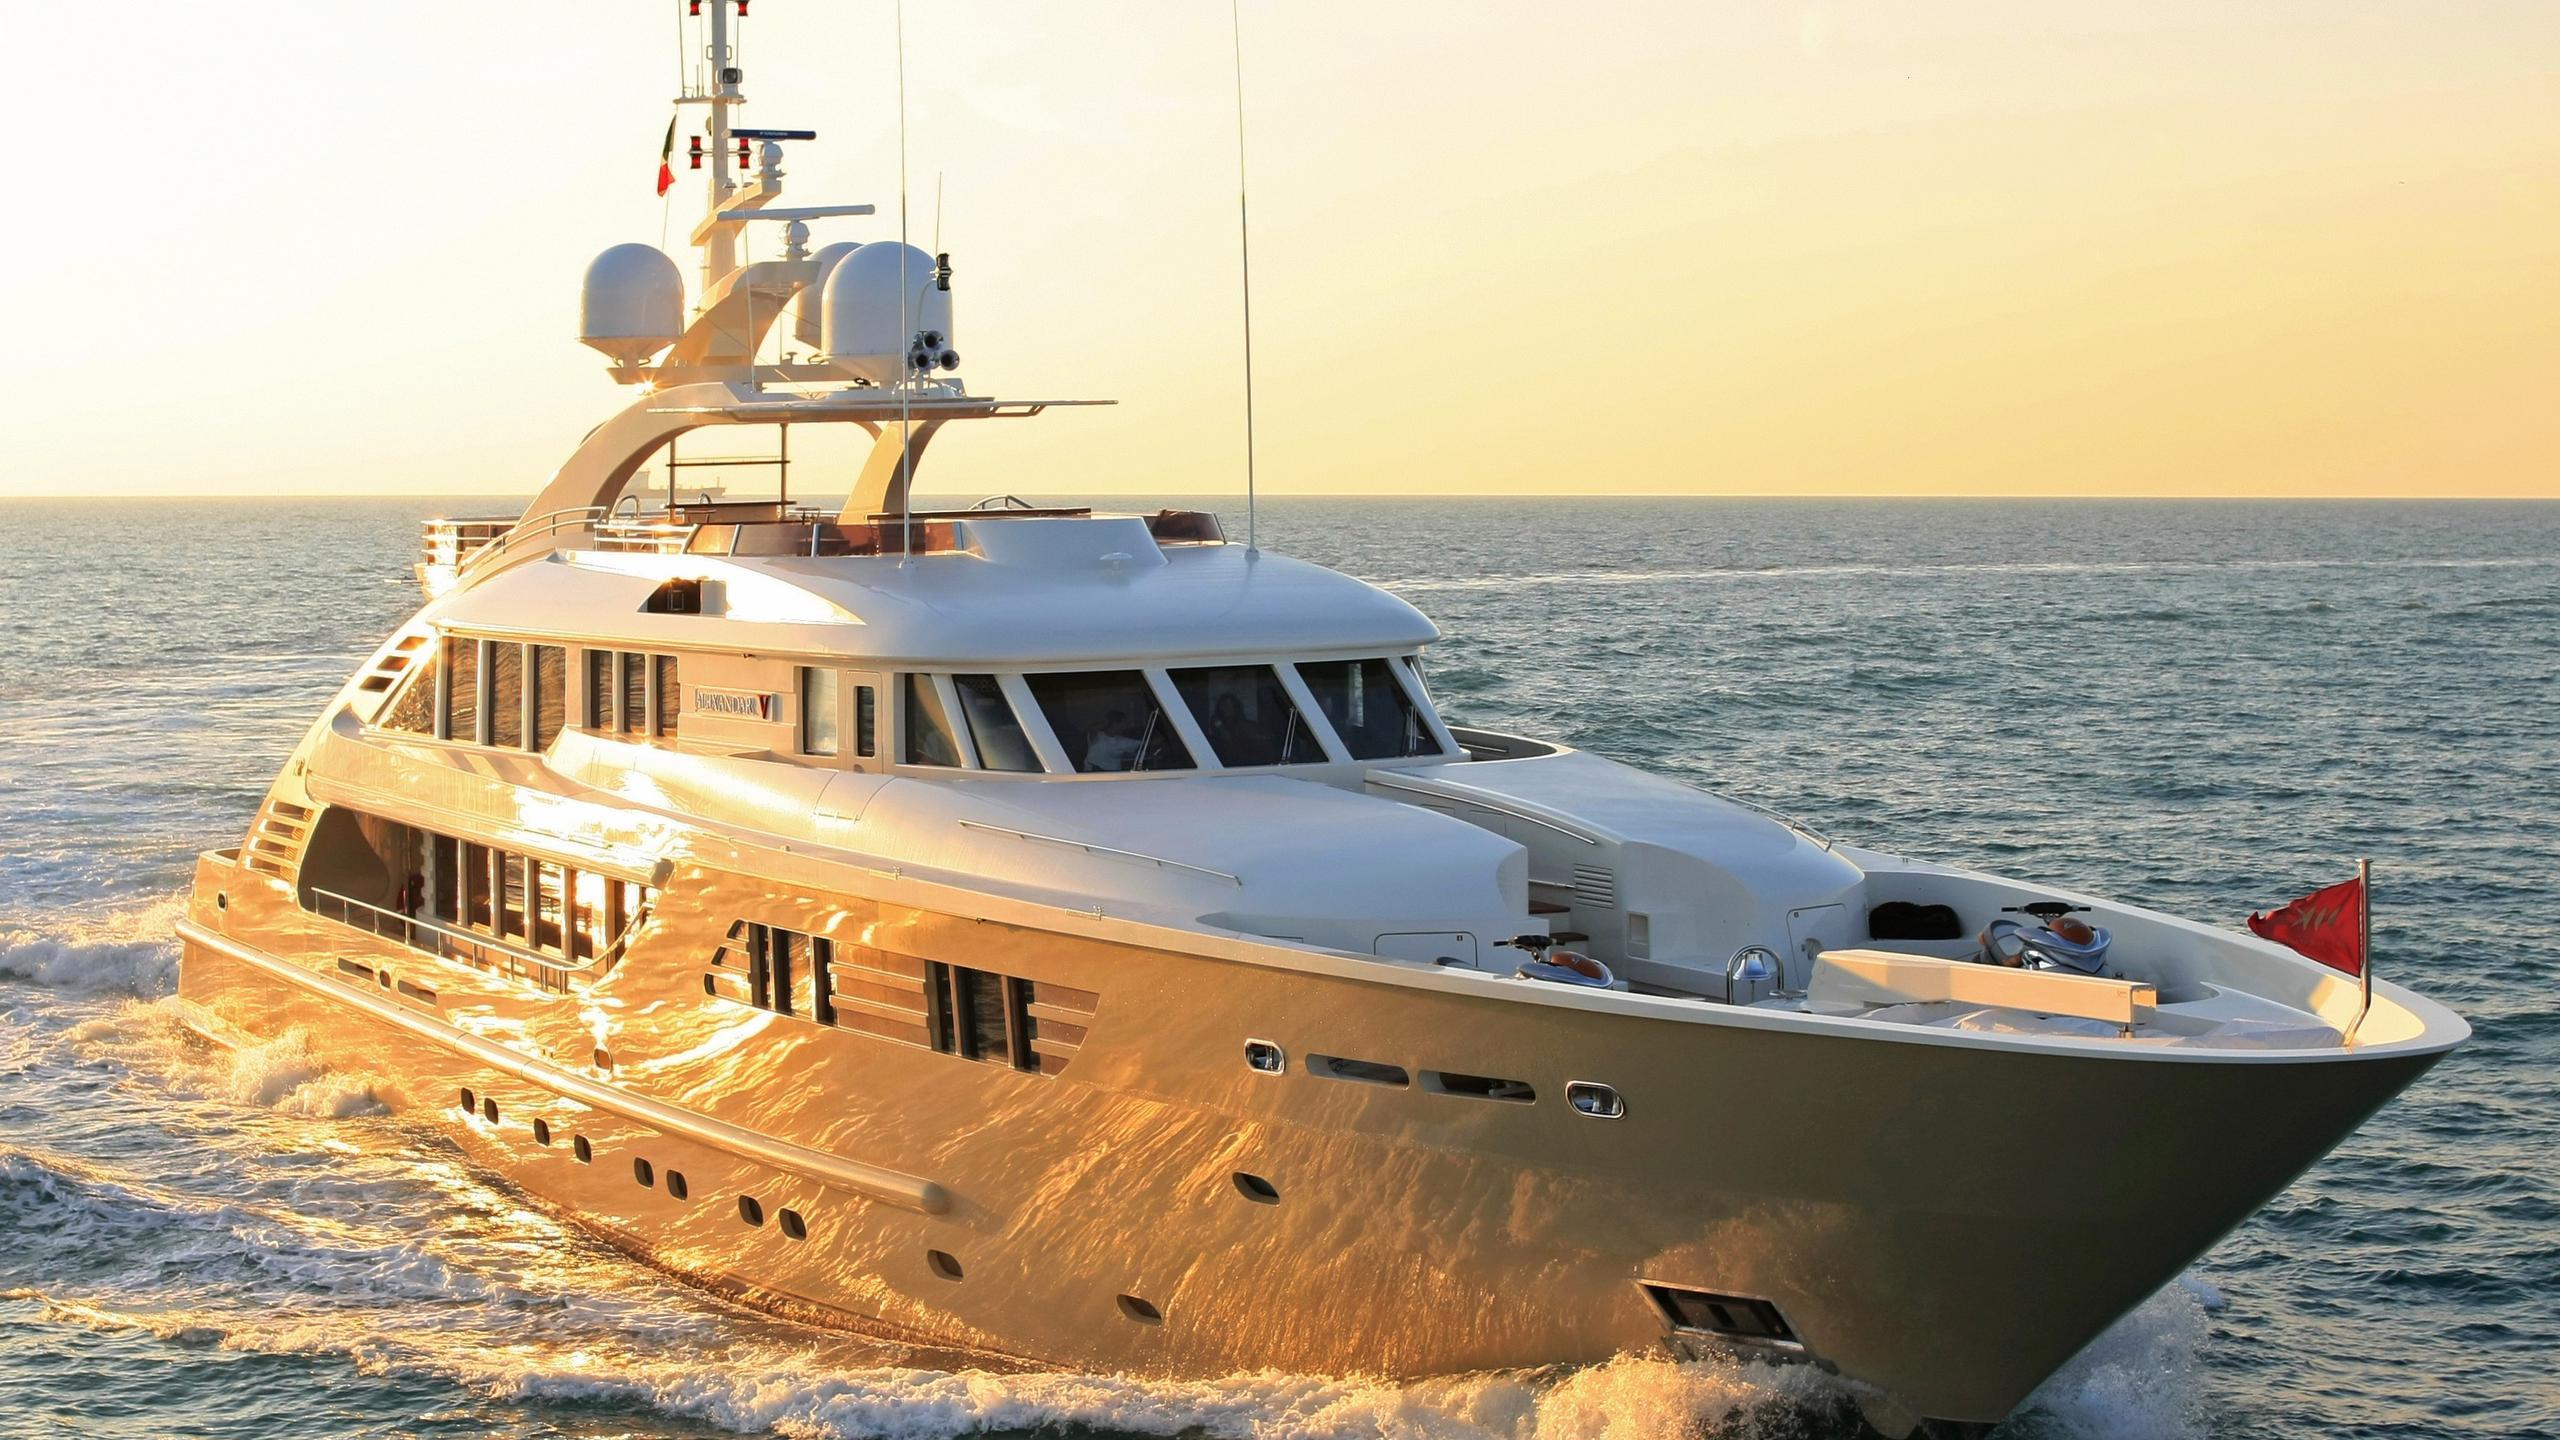 Alexandar V yacht cruising